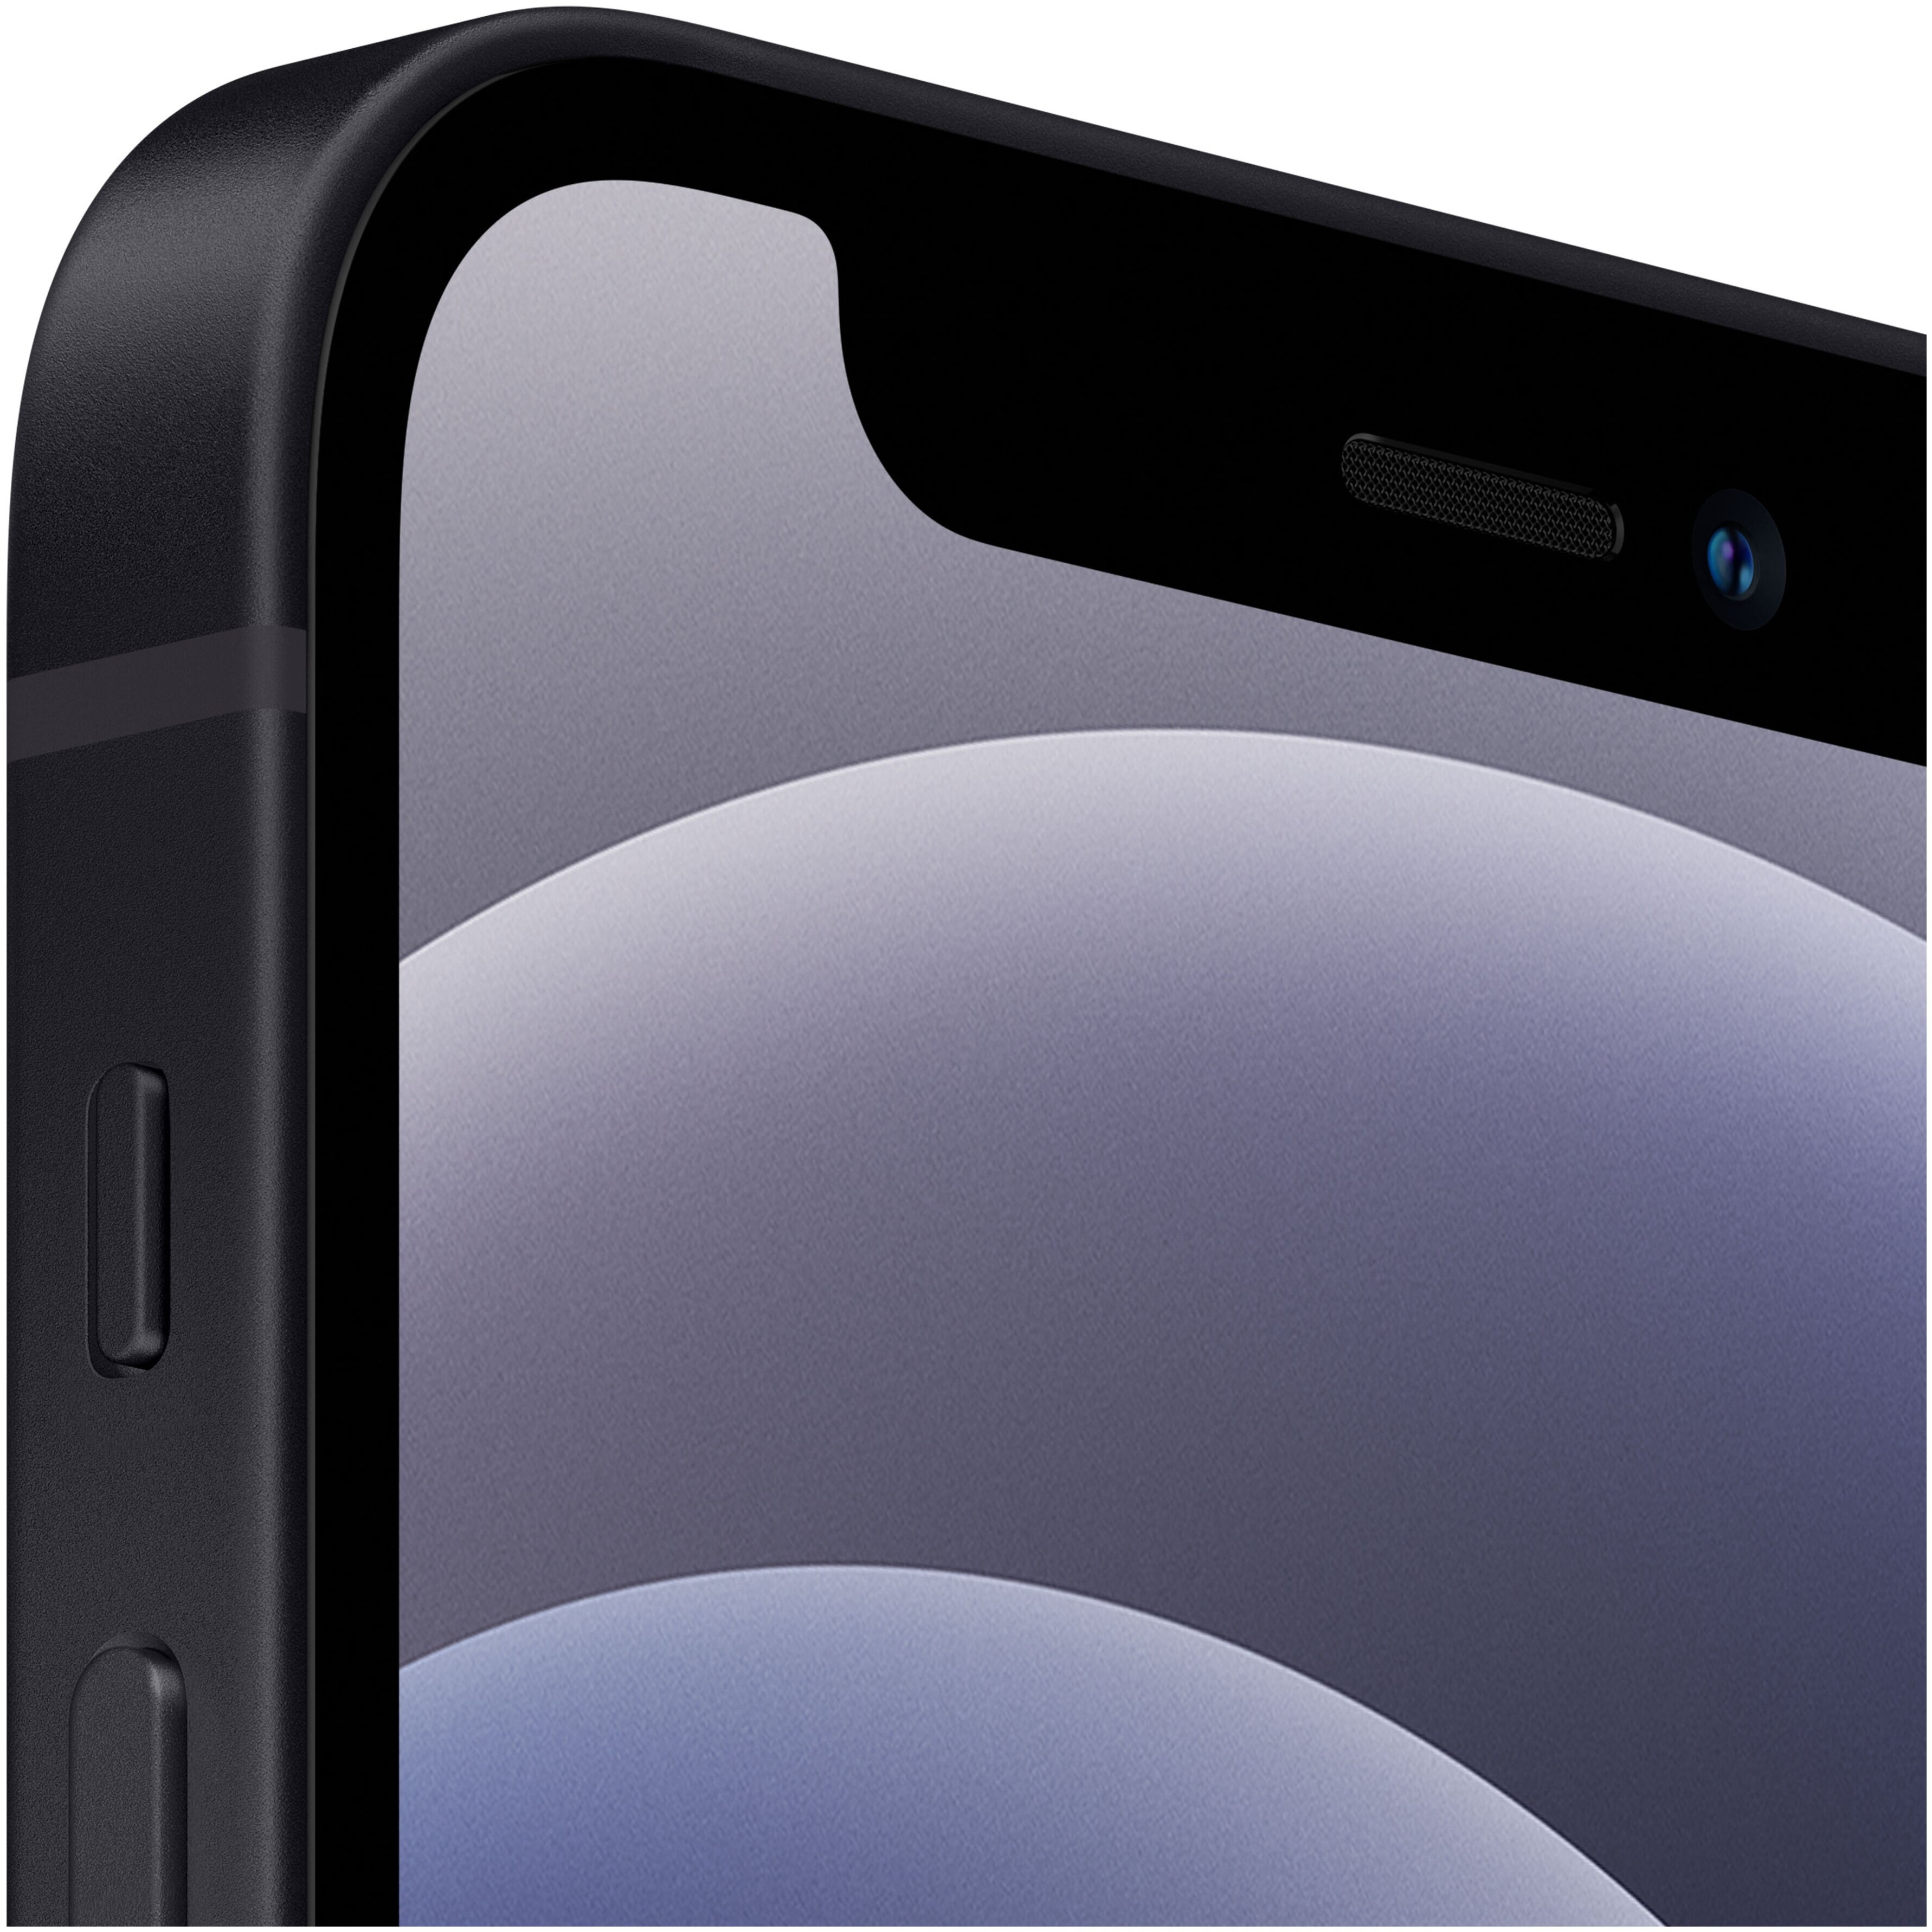 Apple iPhone 12 mini 64GB - степень защиты: IP68